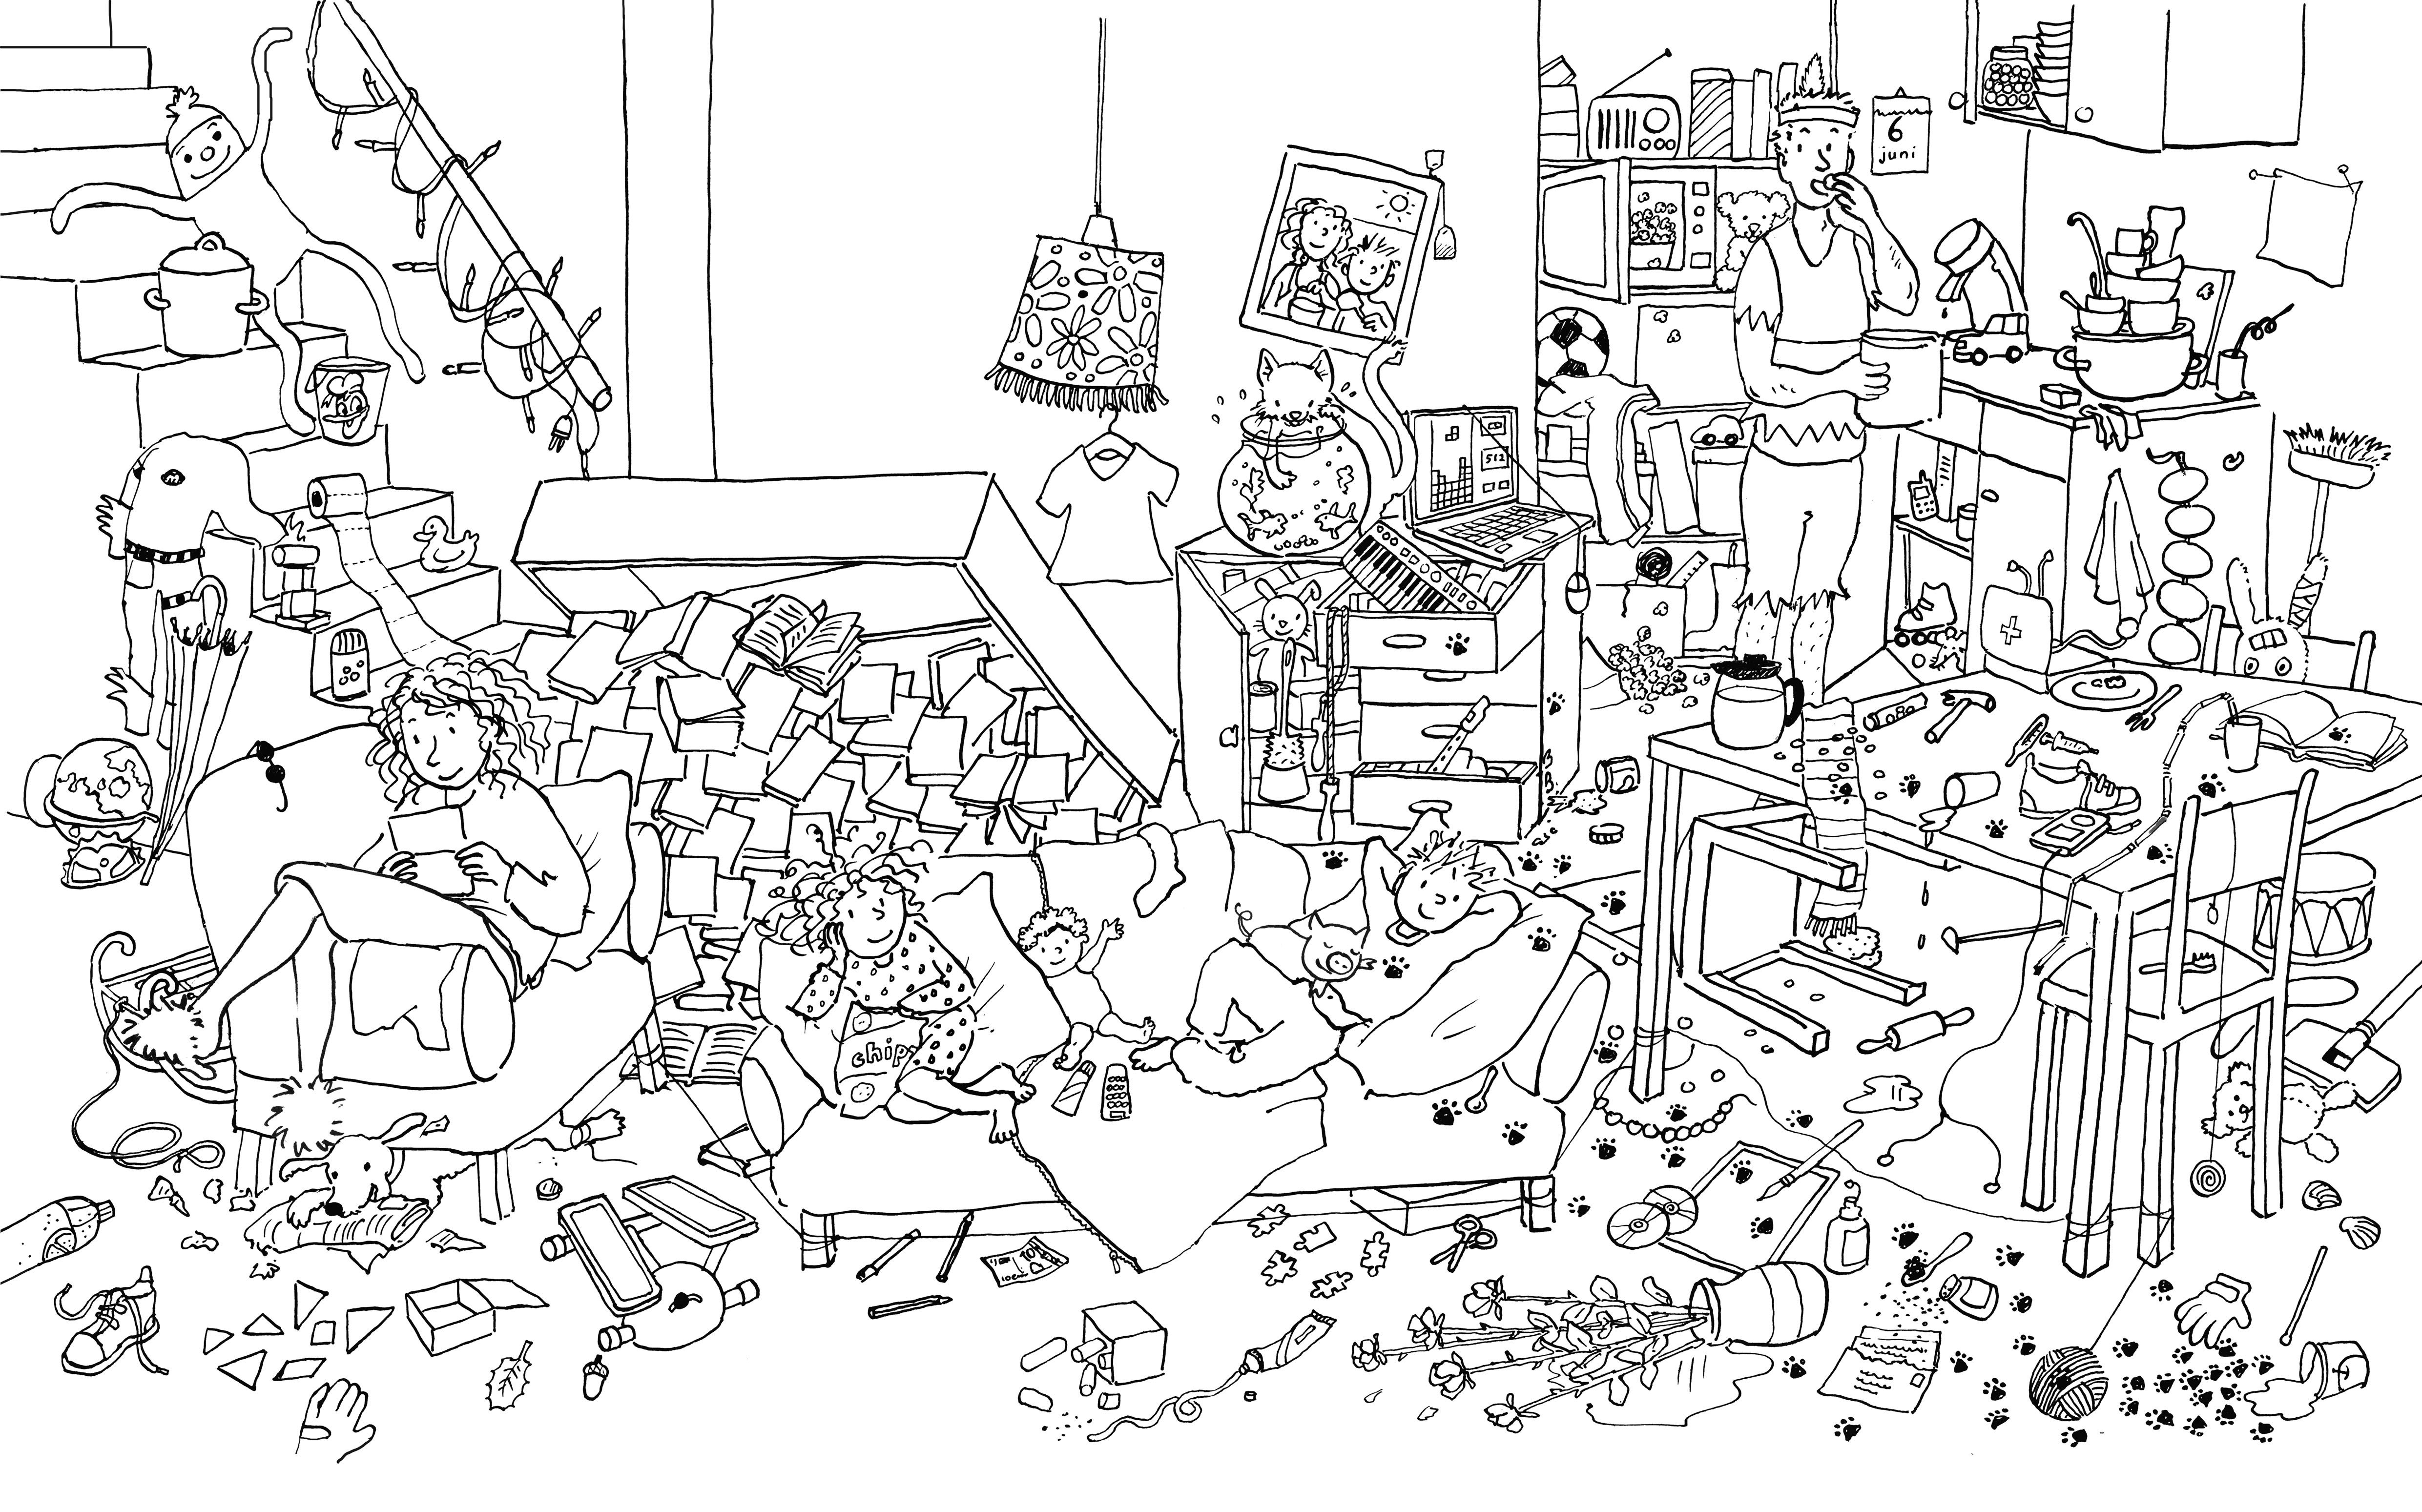 Coloring Page Www Boekencentrum Nl Concept Art Game Background Art Art